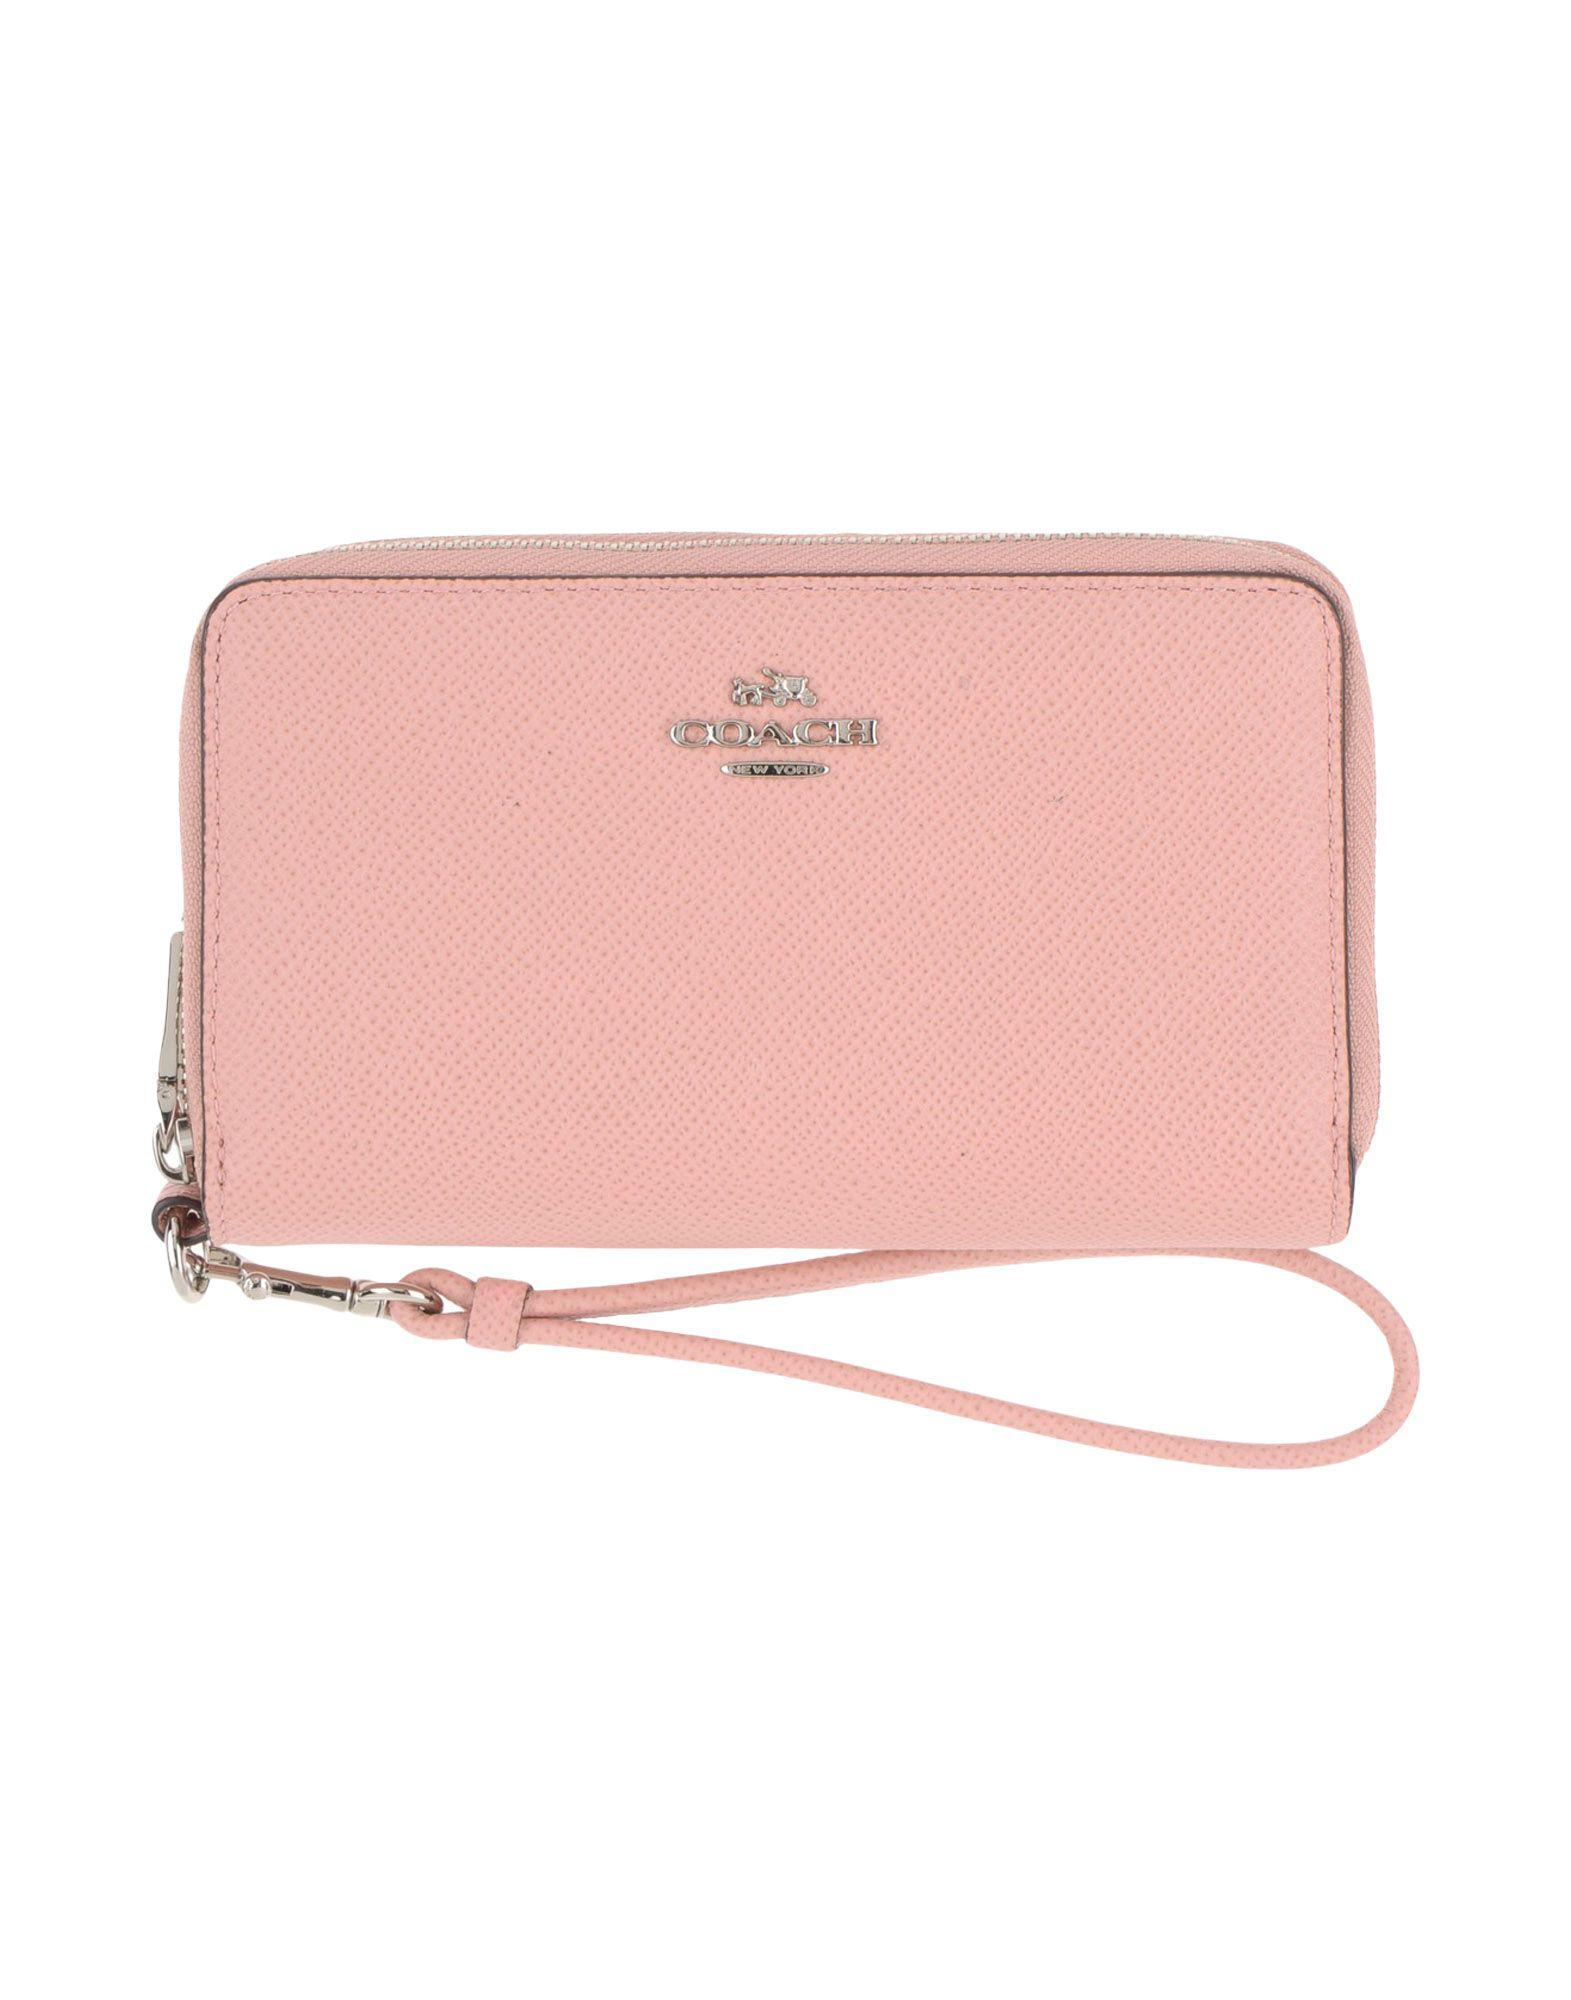 Coach Iphone S Wallet